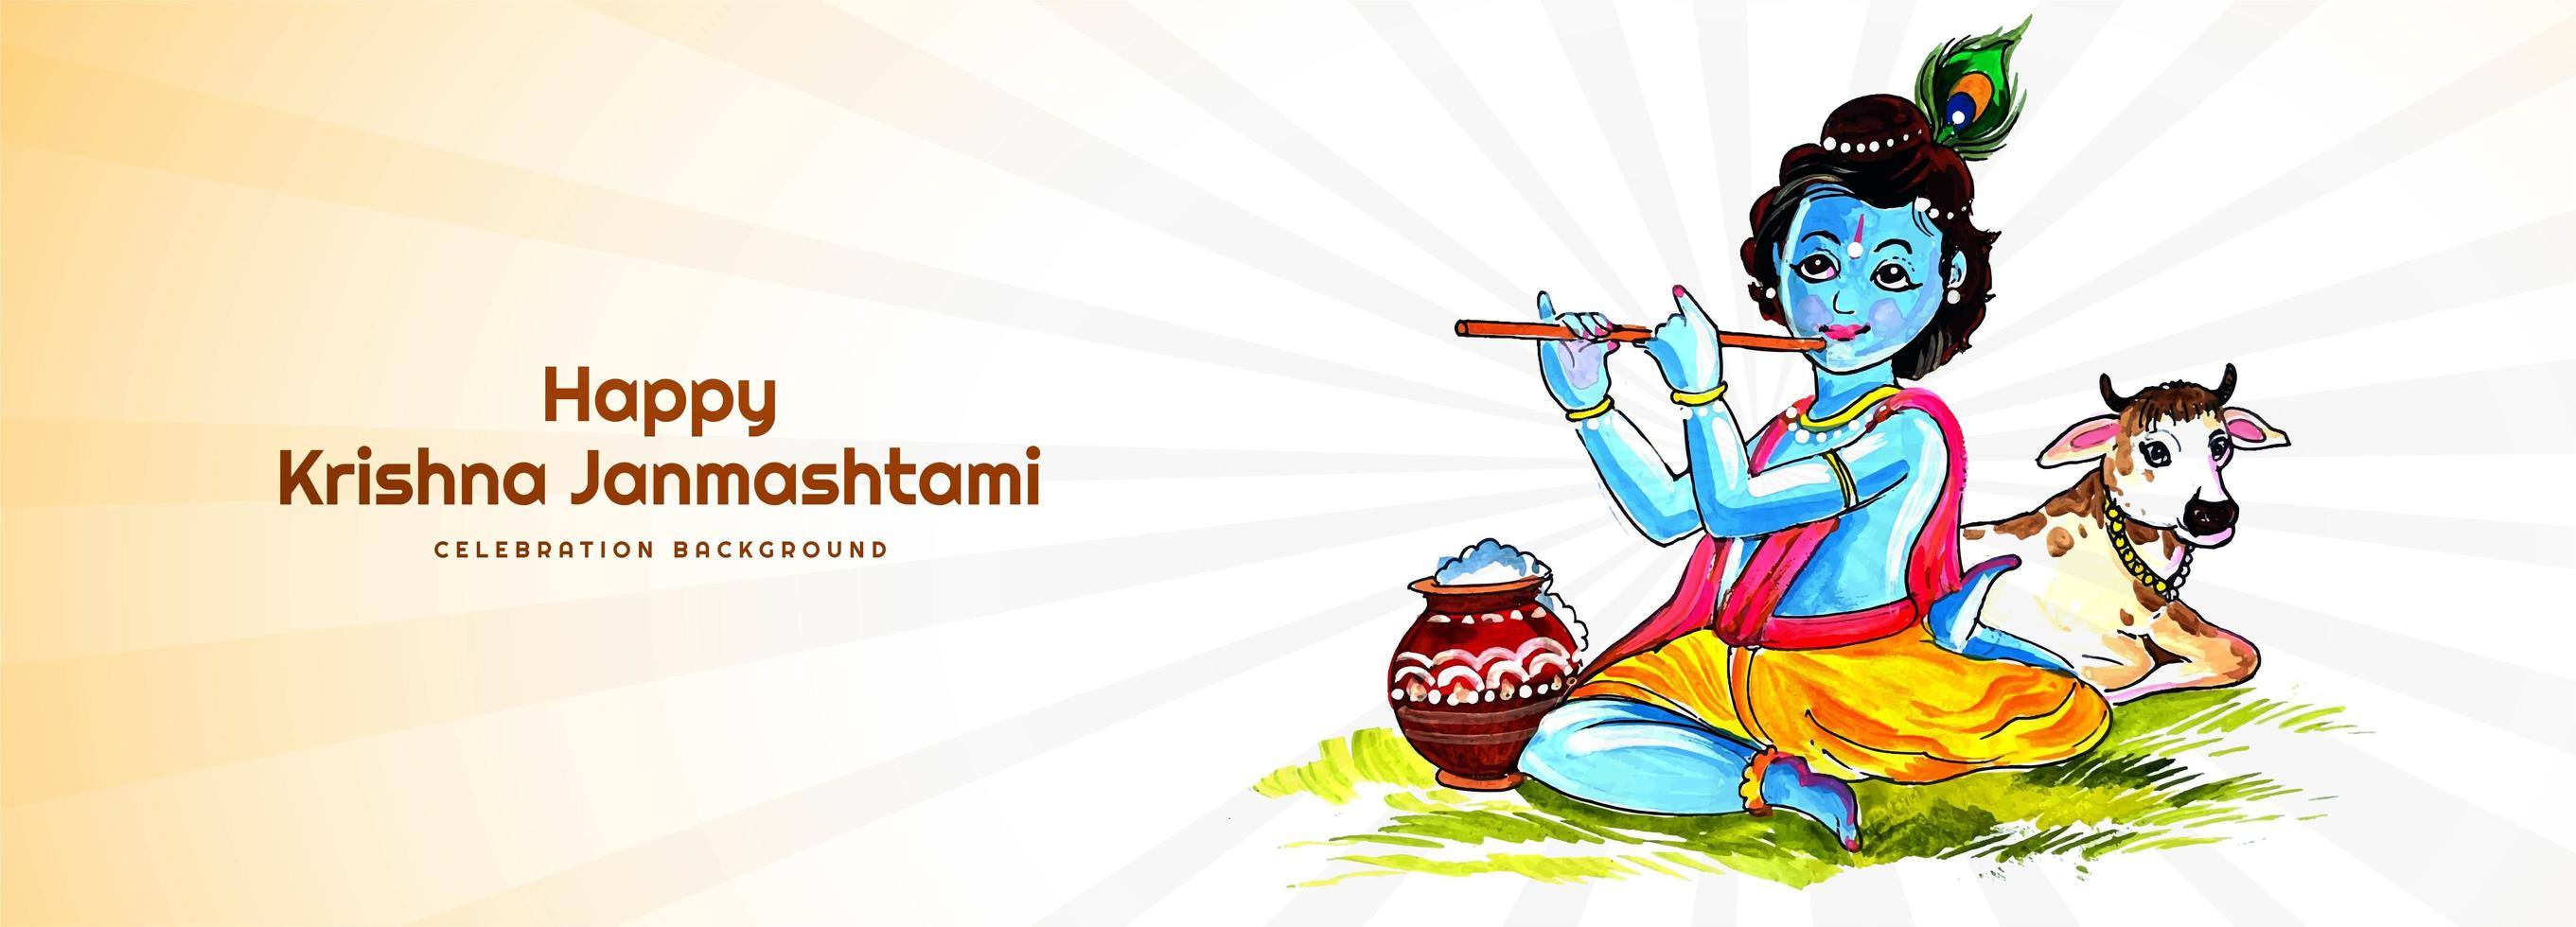 Happy Krishna Janmashtami Playing Flute Festival Banner vector